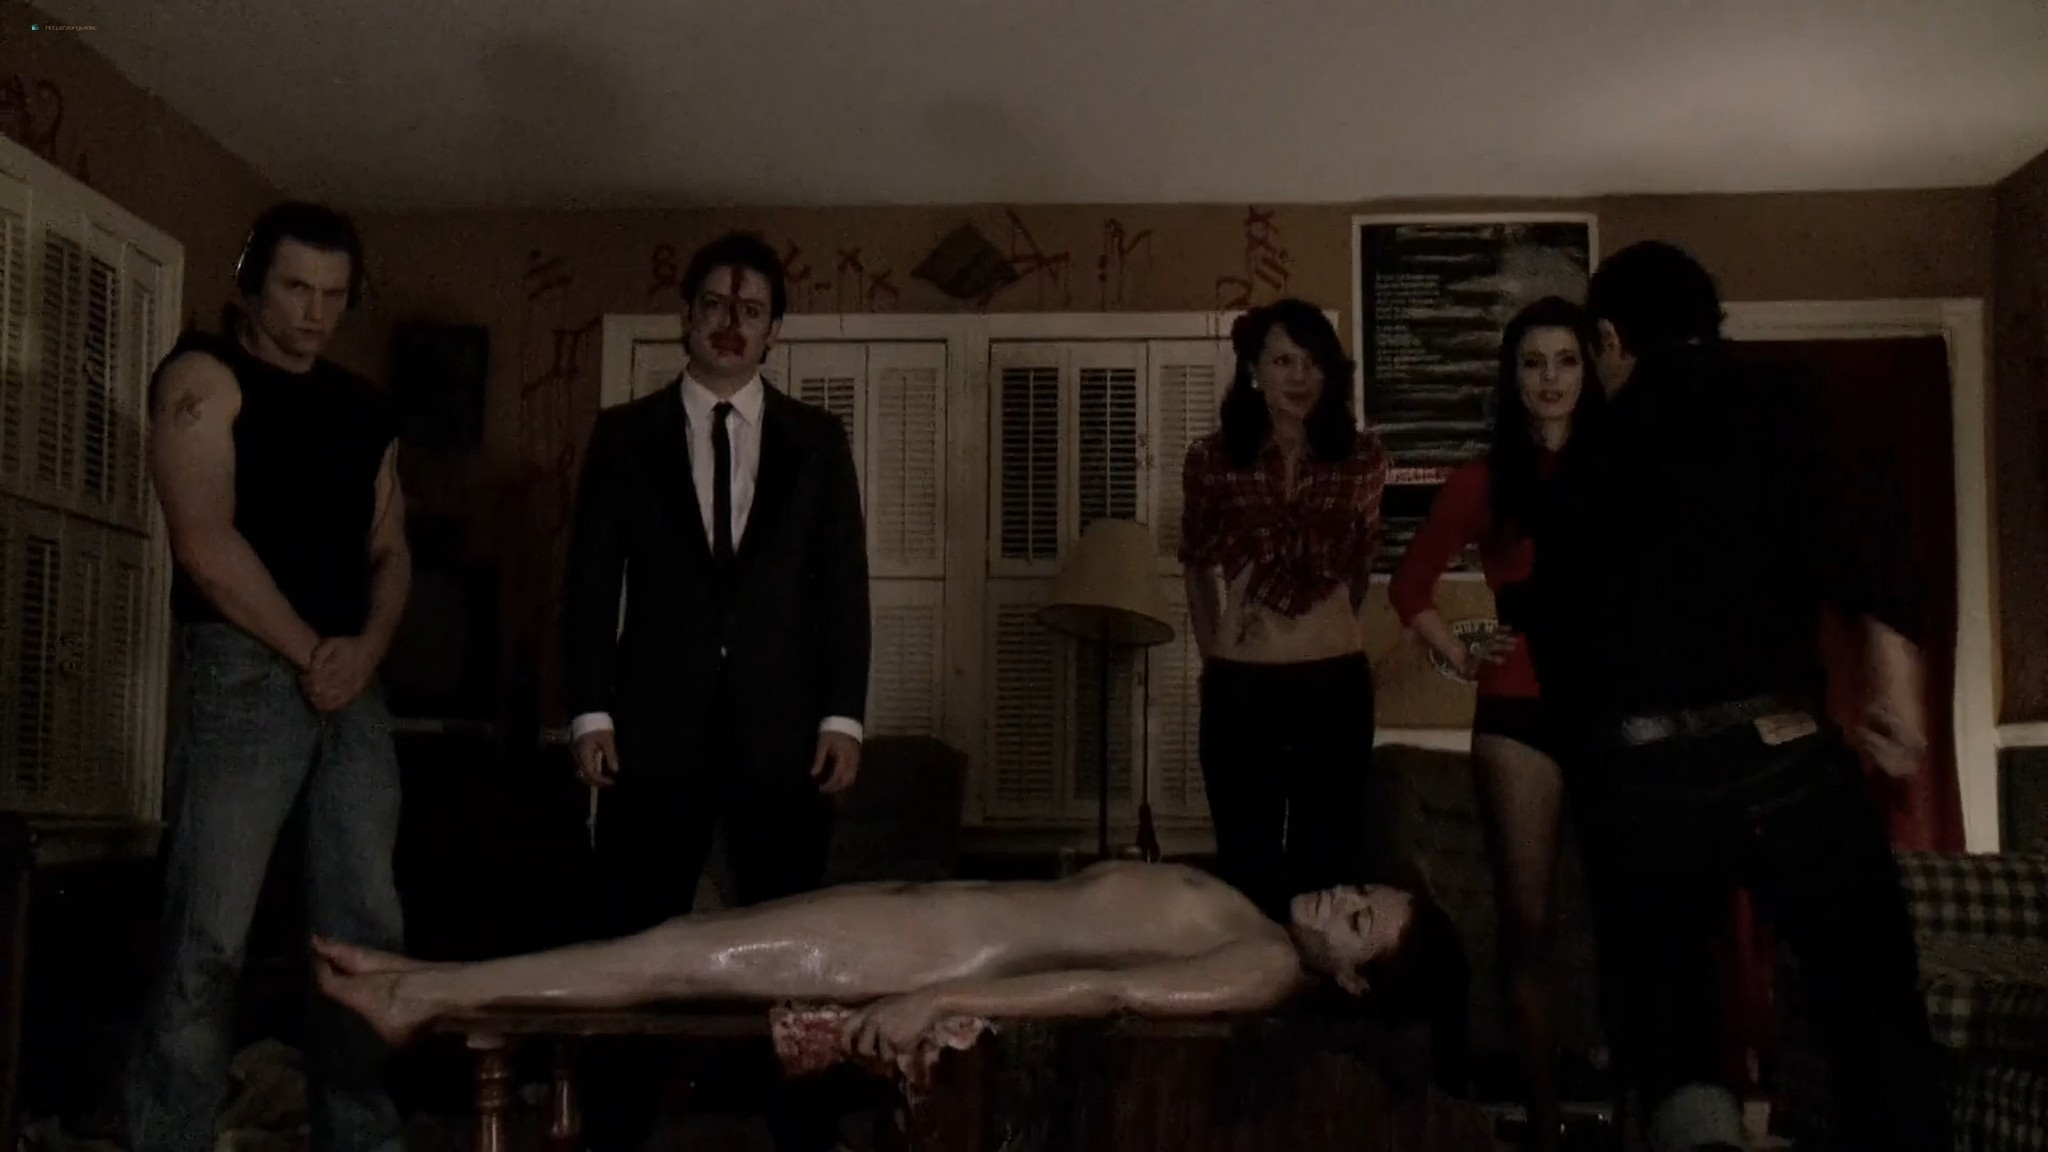 Taylor Cole hot sex Tiffany Shepis Francesca Brandelius naked The Violent Kind 2010 HD 1080p BluRay 012